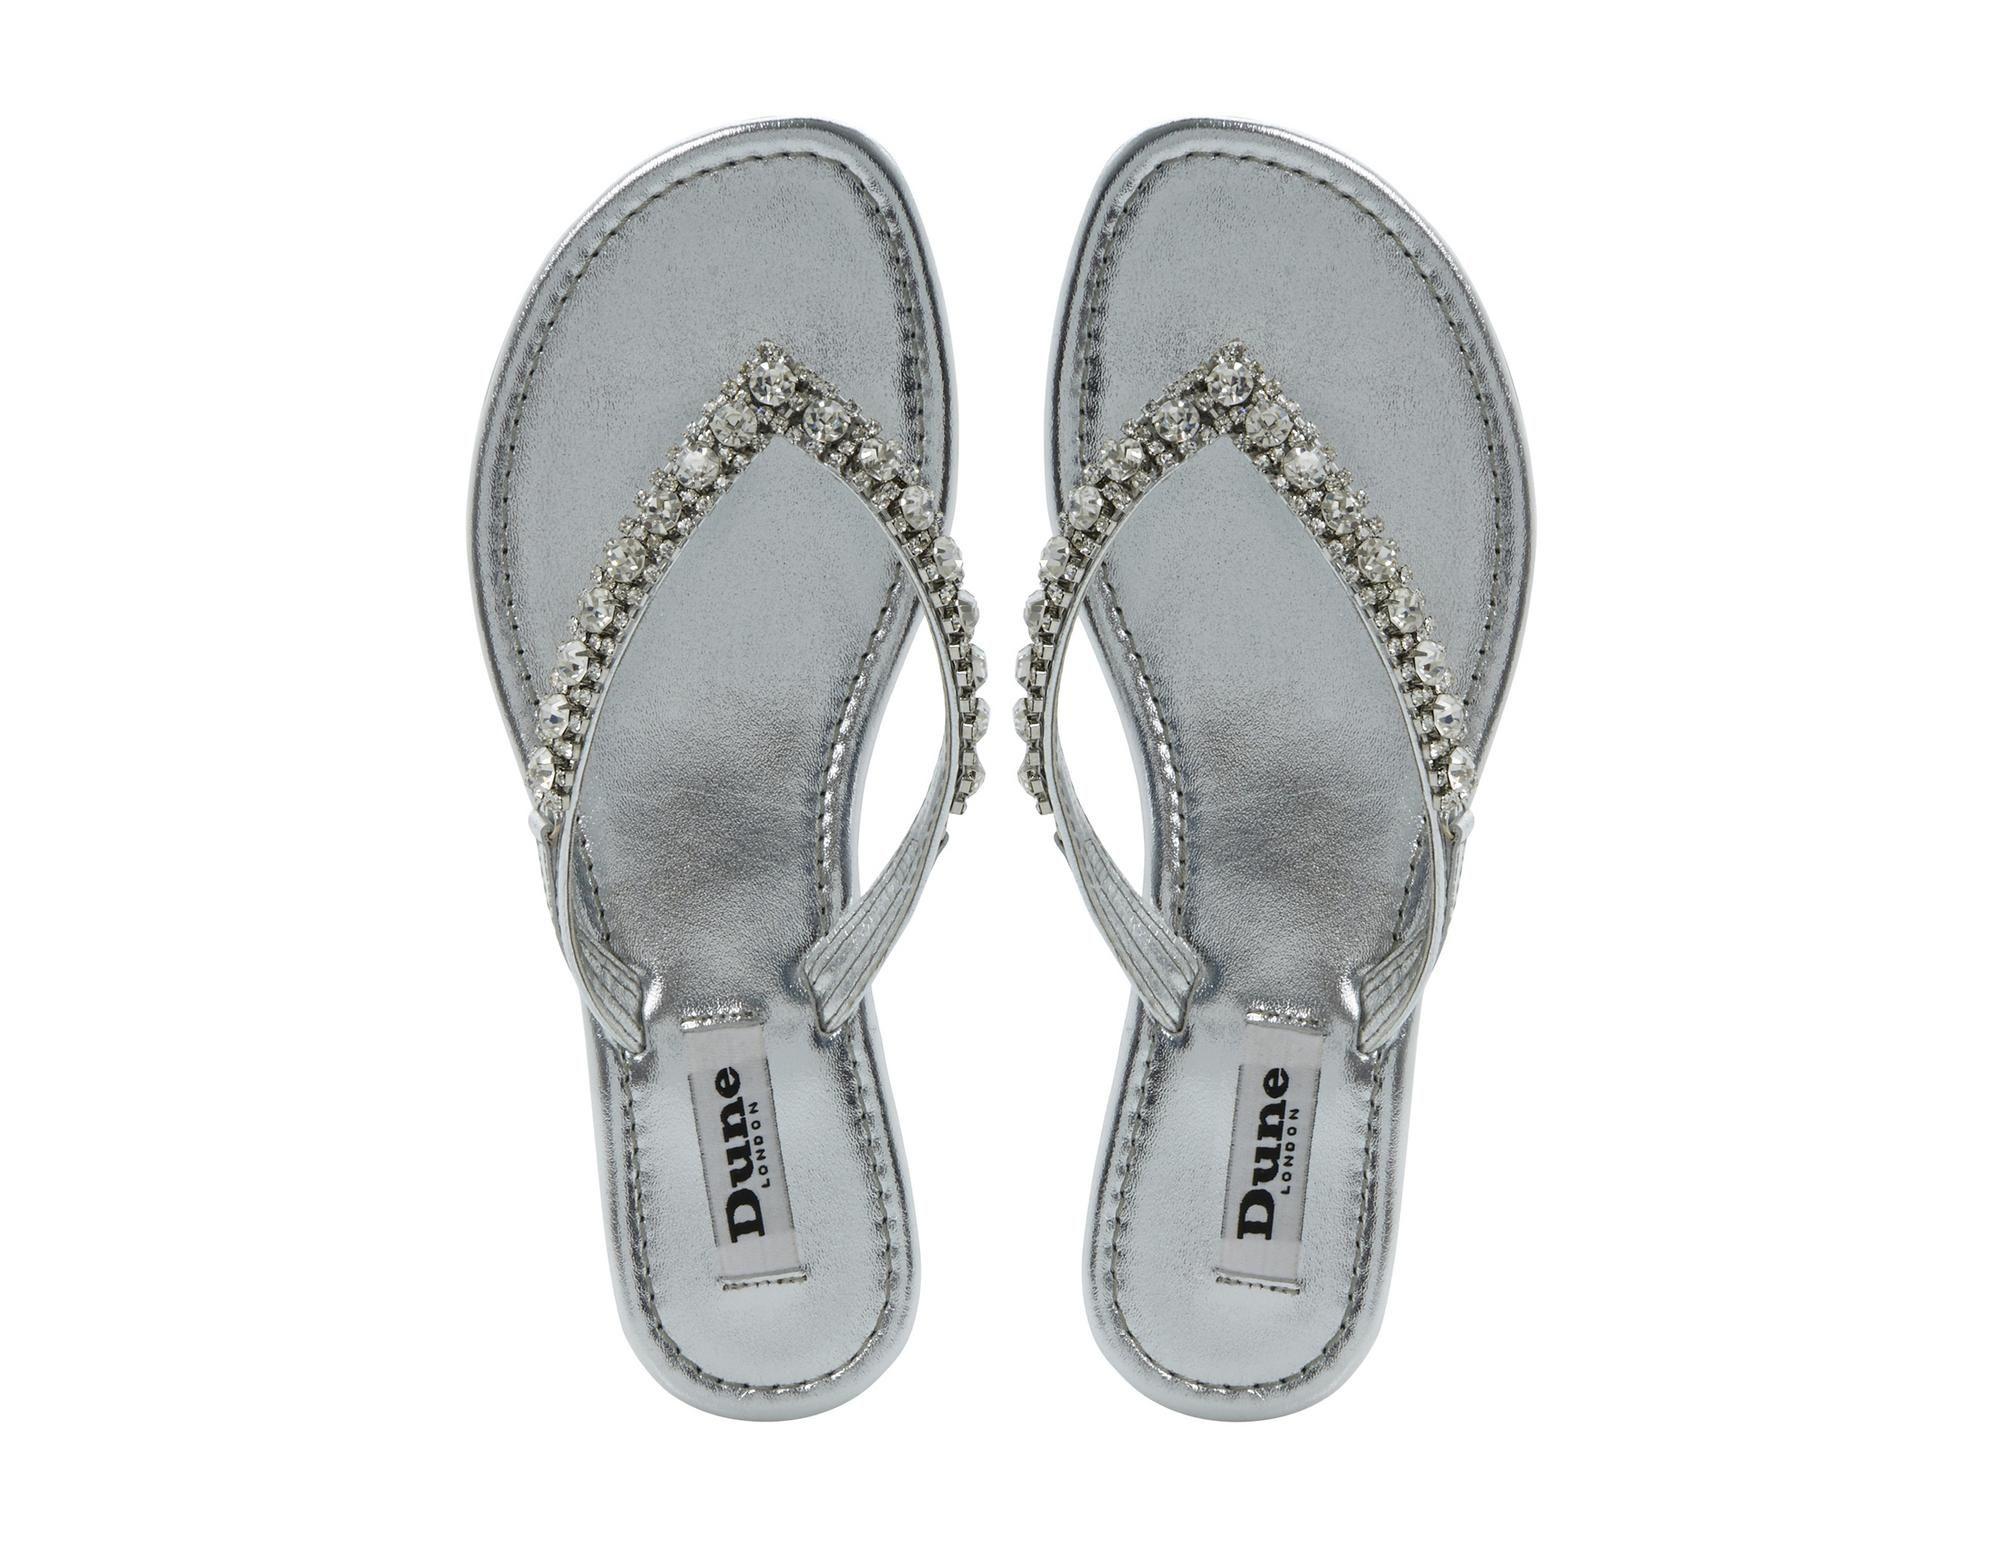 3c53da3d2 DUNE LADIES KIKI - Diamante Toe Post Flat Sandal - silver